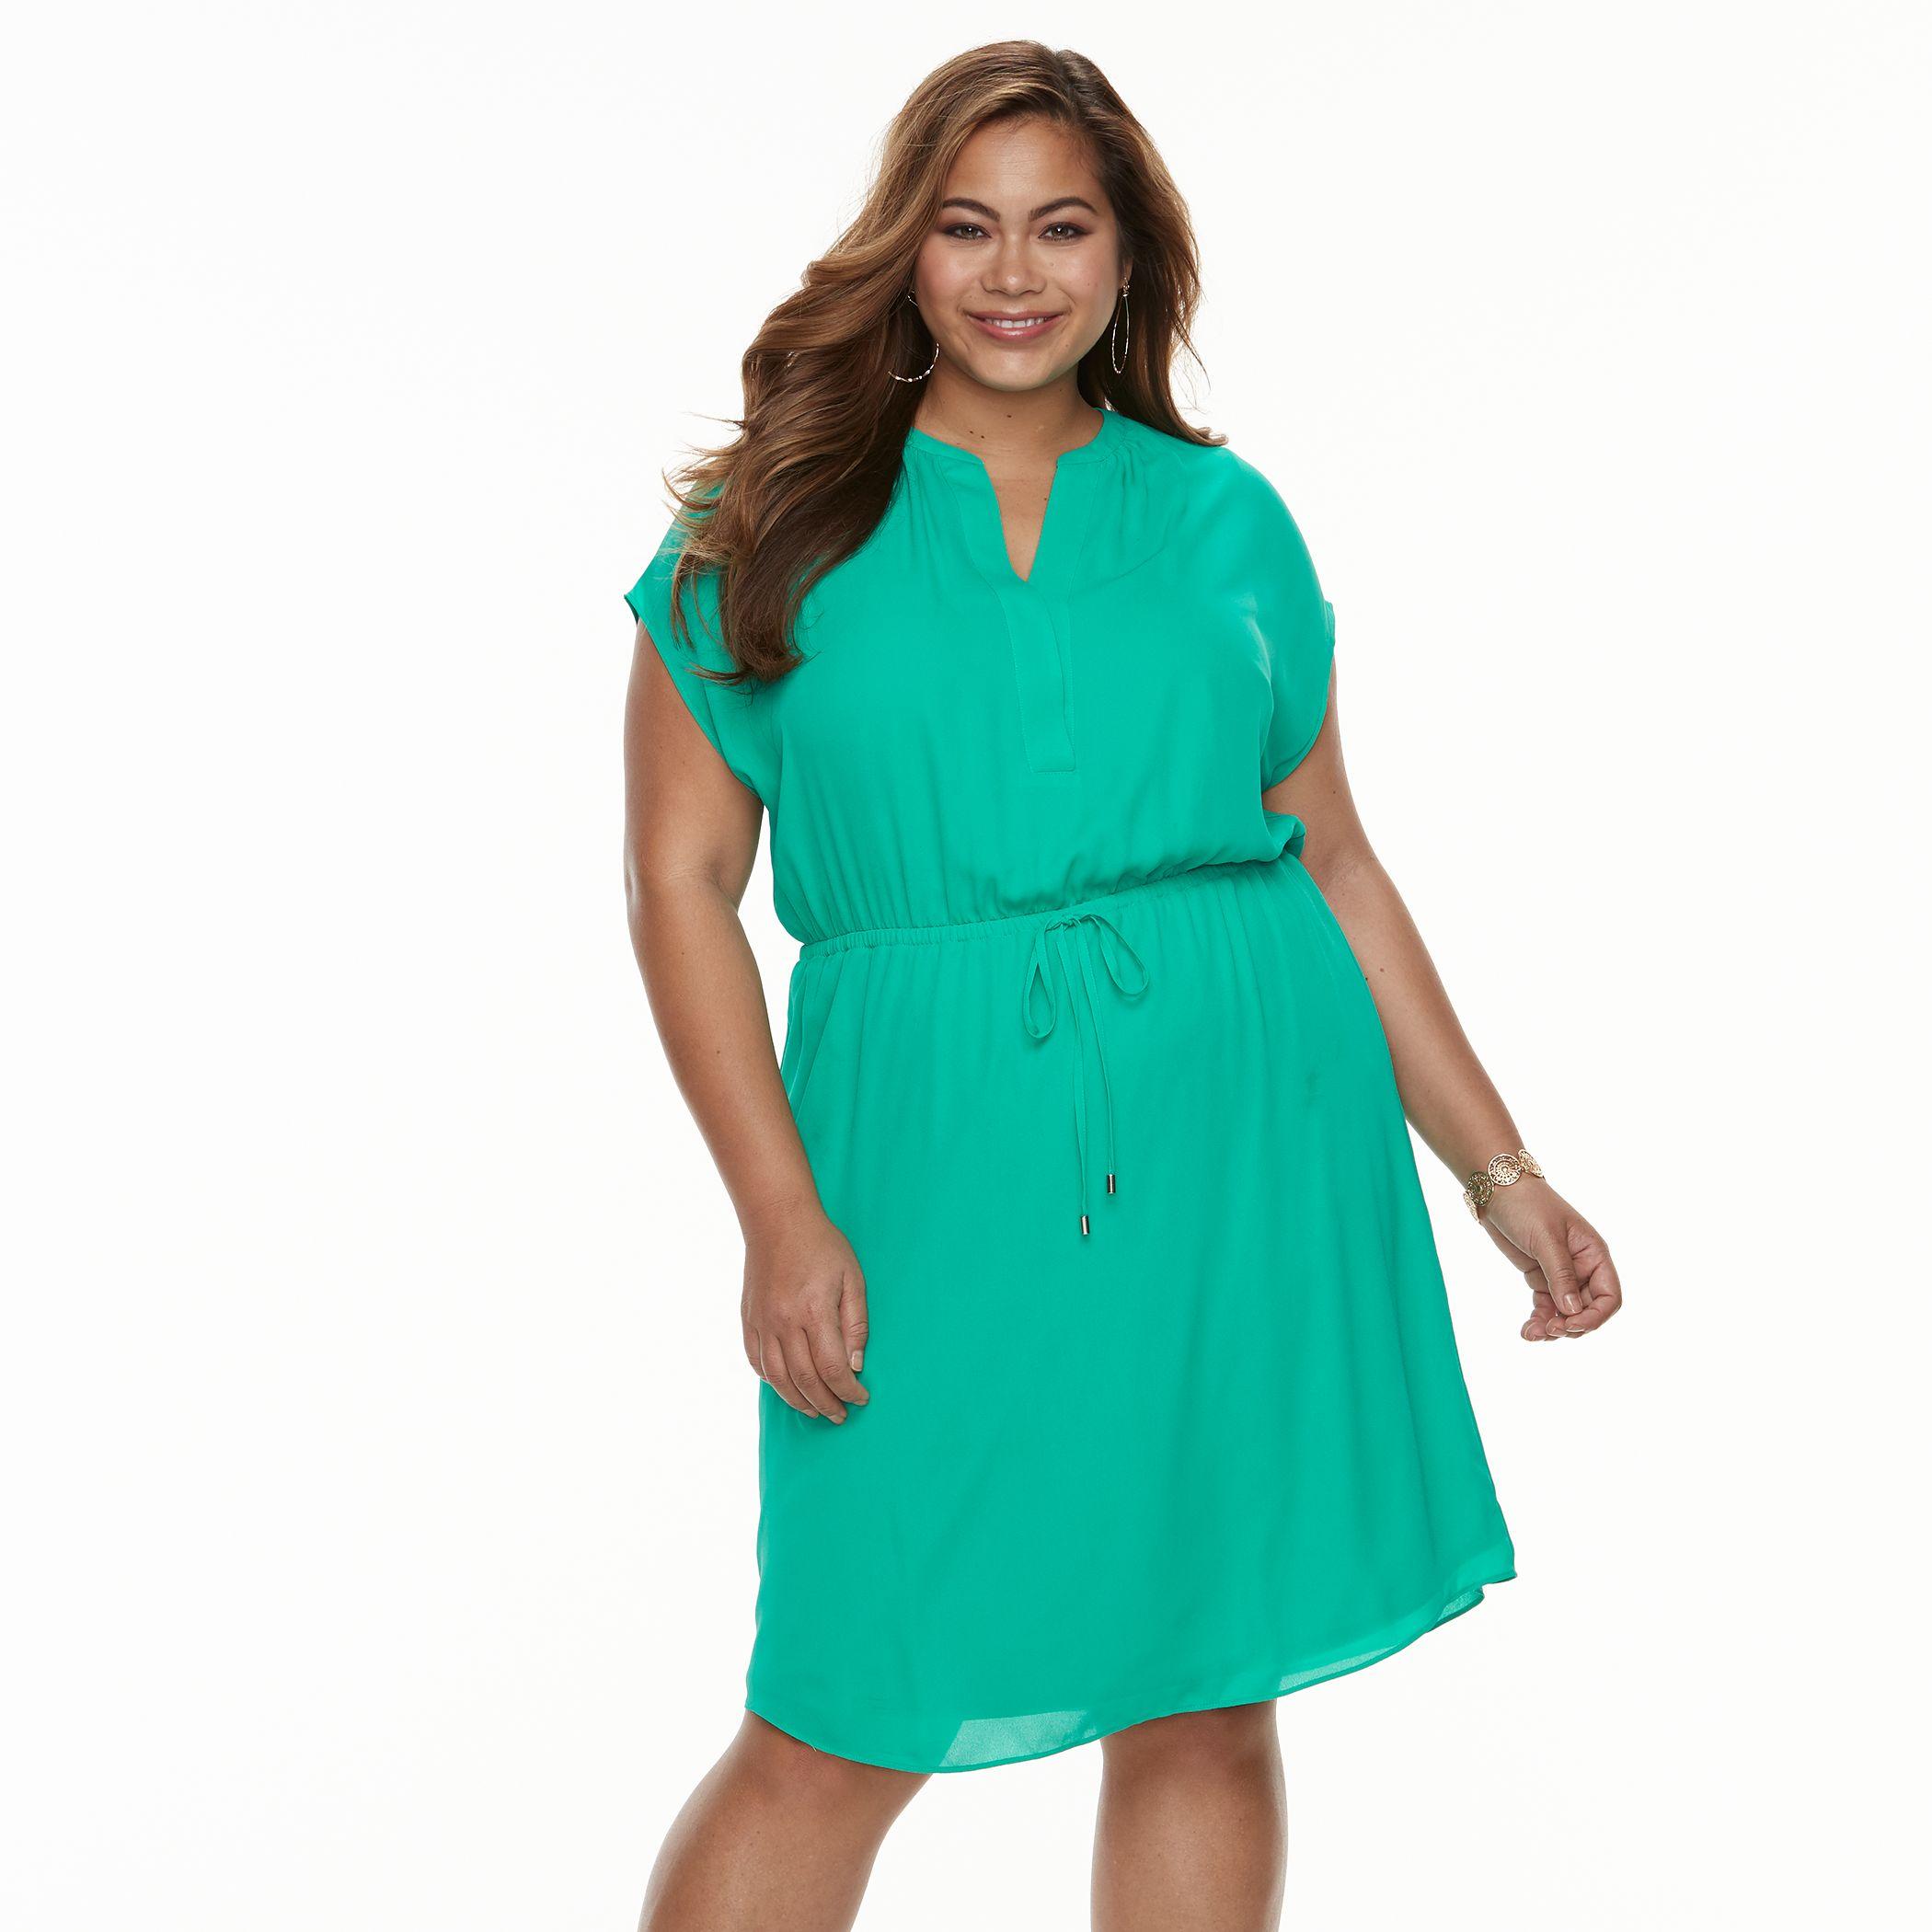 Olive Green Formal Dress for Juniors